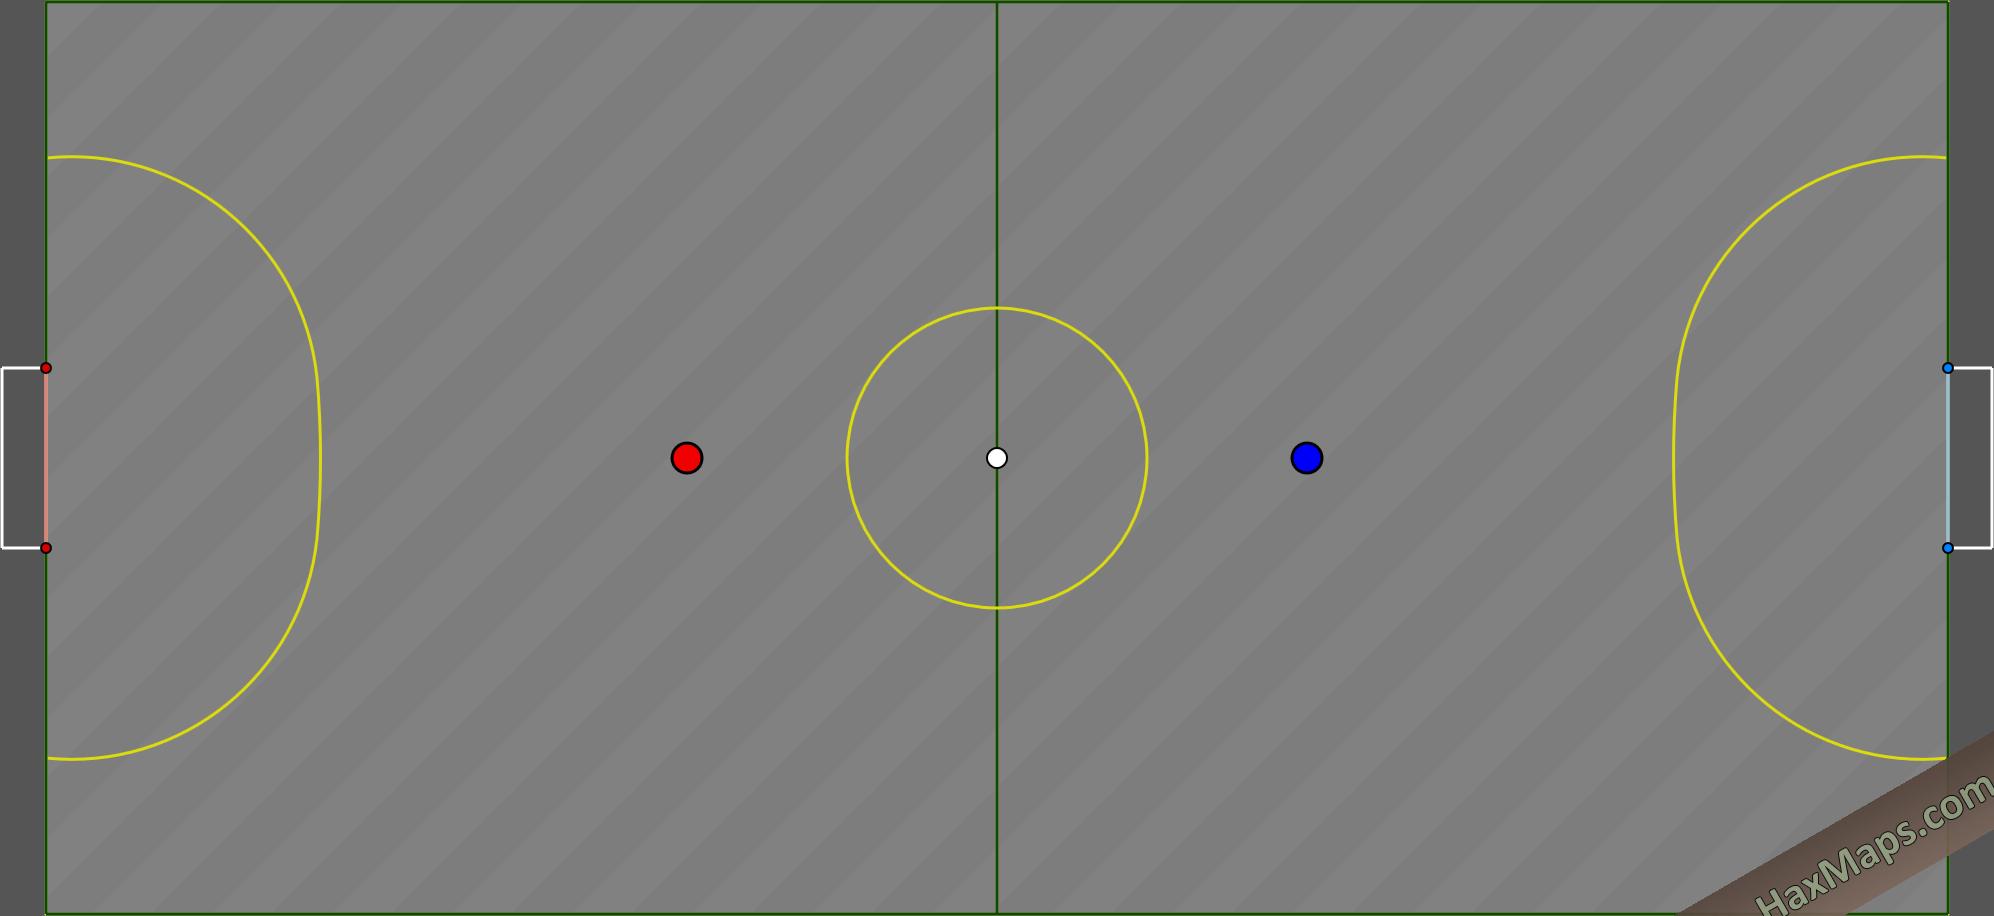 hax ball maps | CHB futsal x5